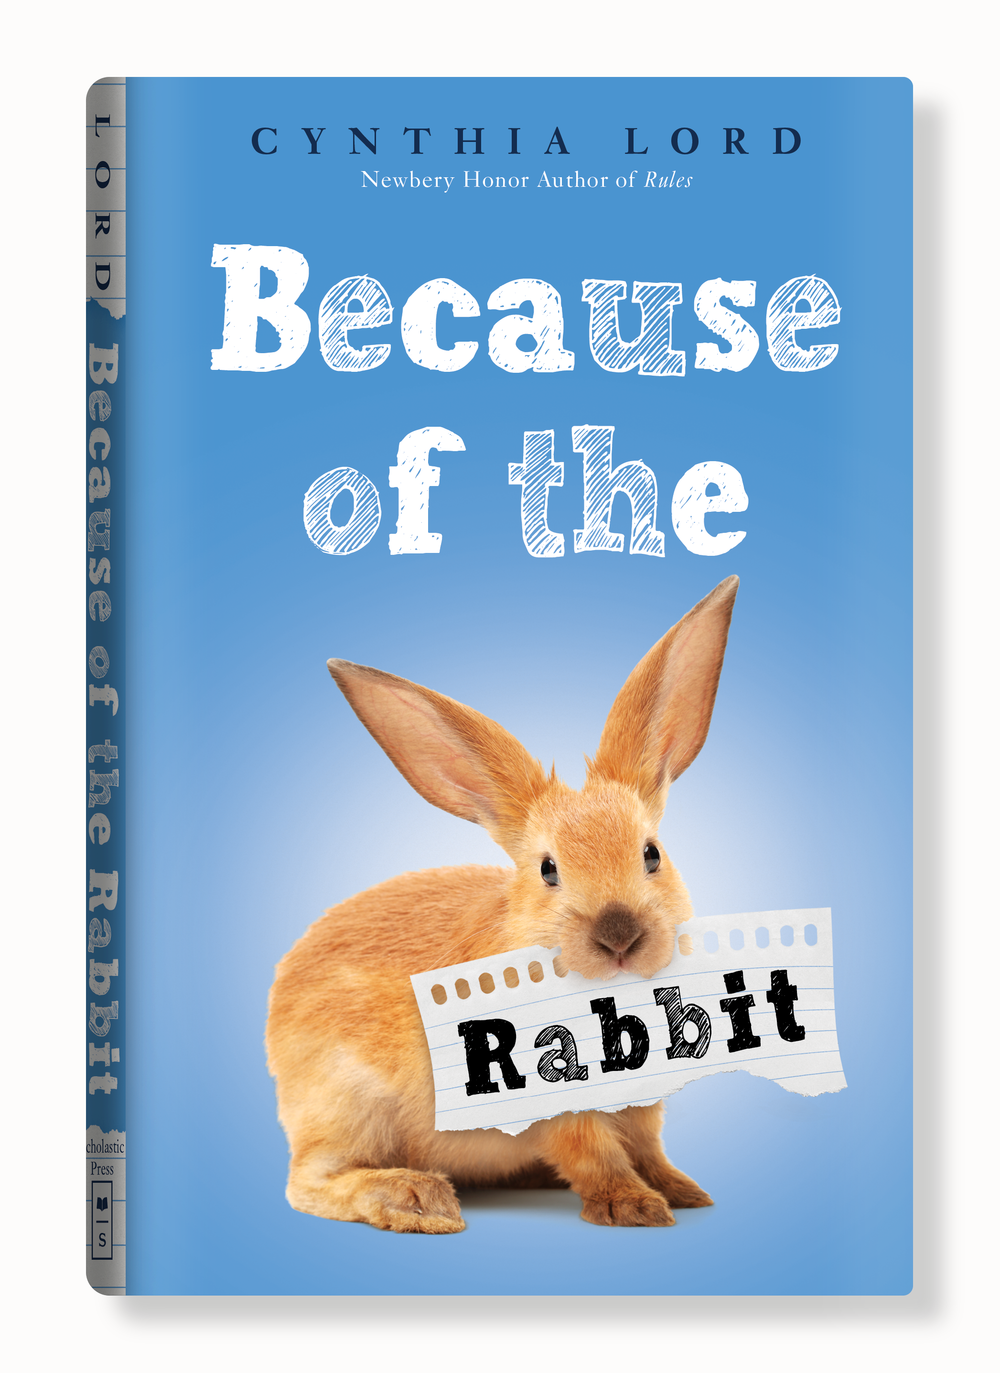 Cover photos © Shutterstock: rabbit (Jiang Hongyan), paper (ESB Professional)